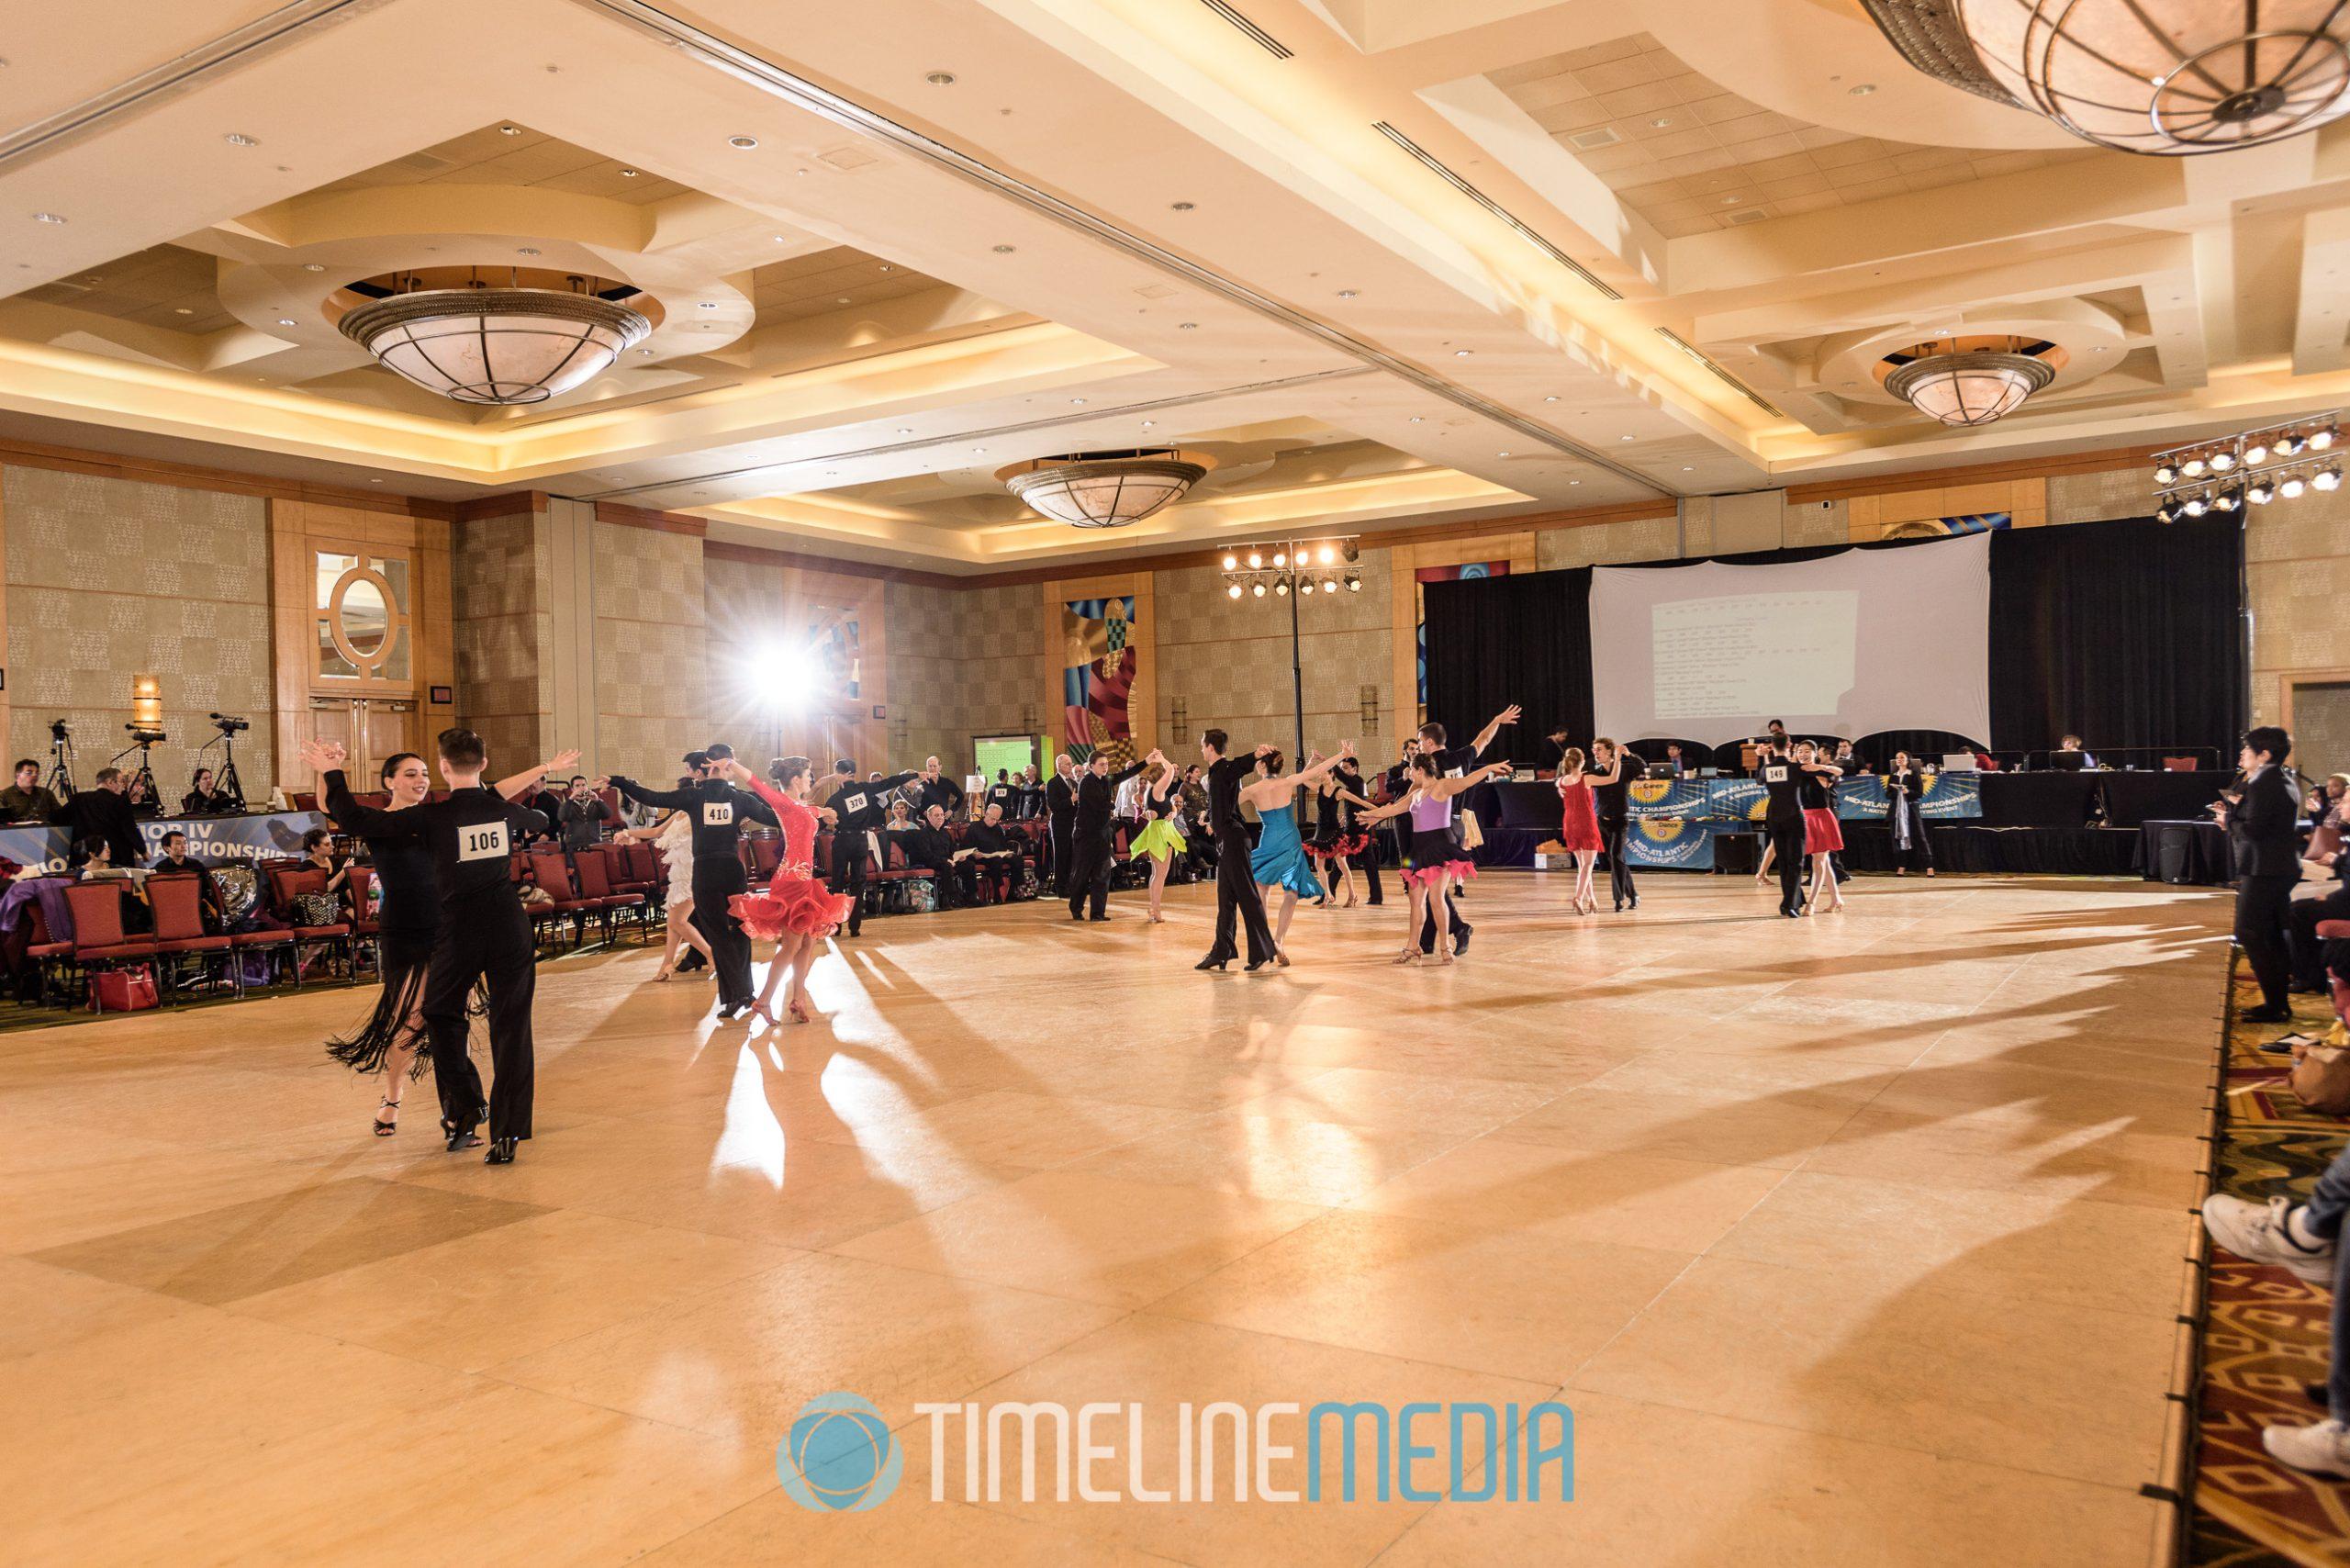 Bethesda North Marriott Hotel ballroom dance floor ©TimeLine Media